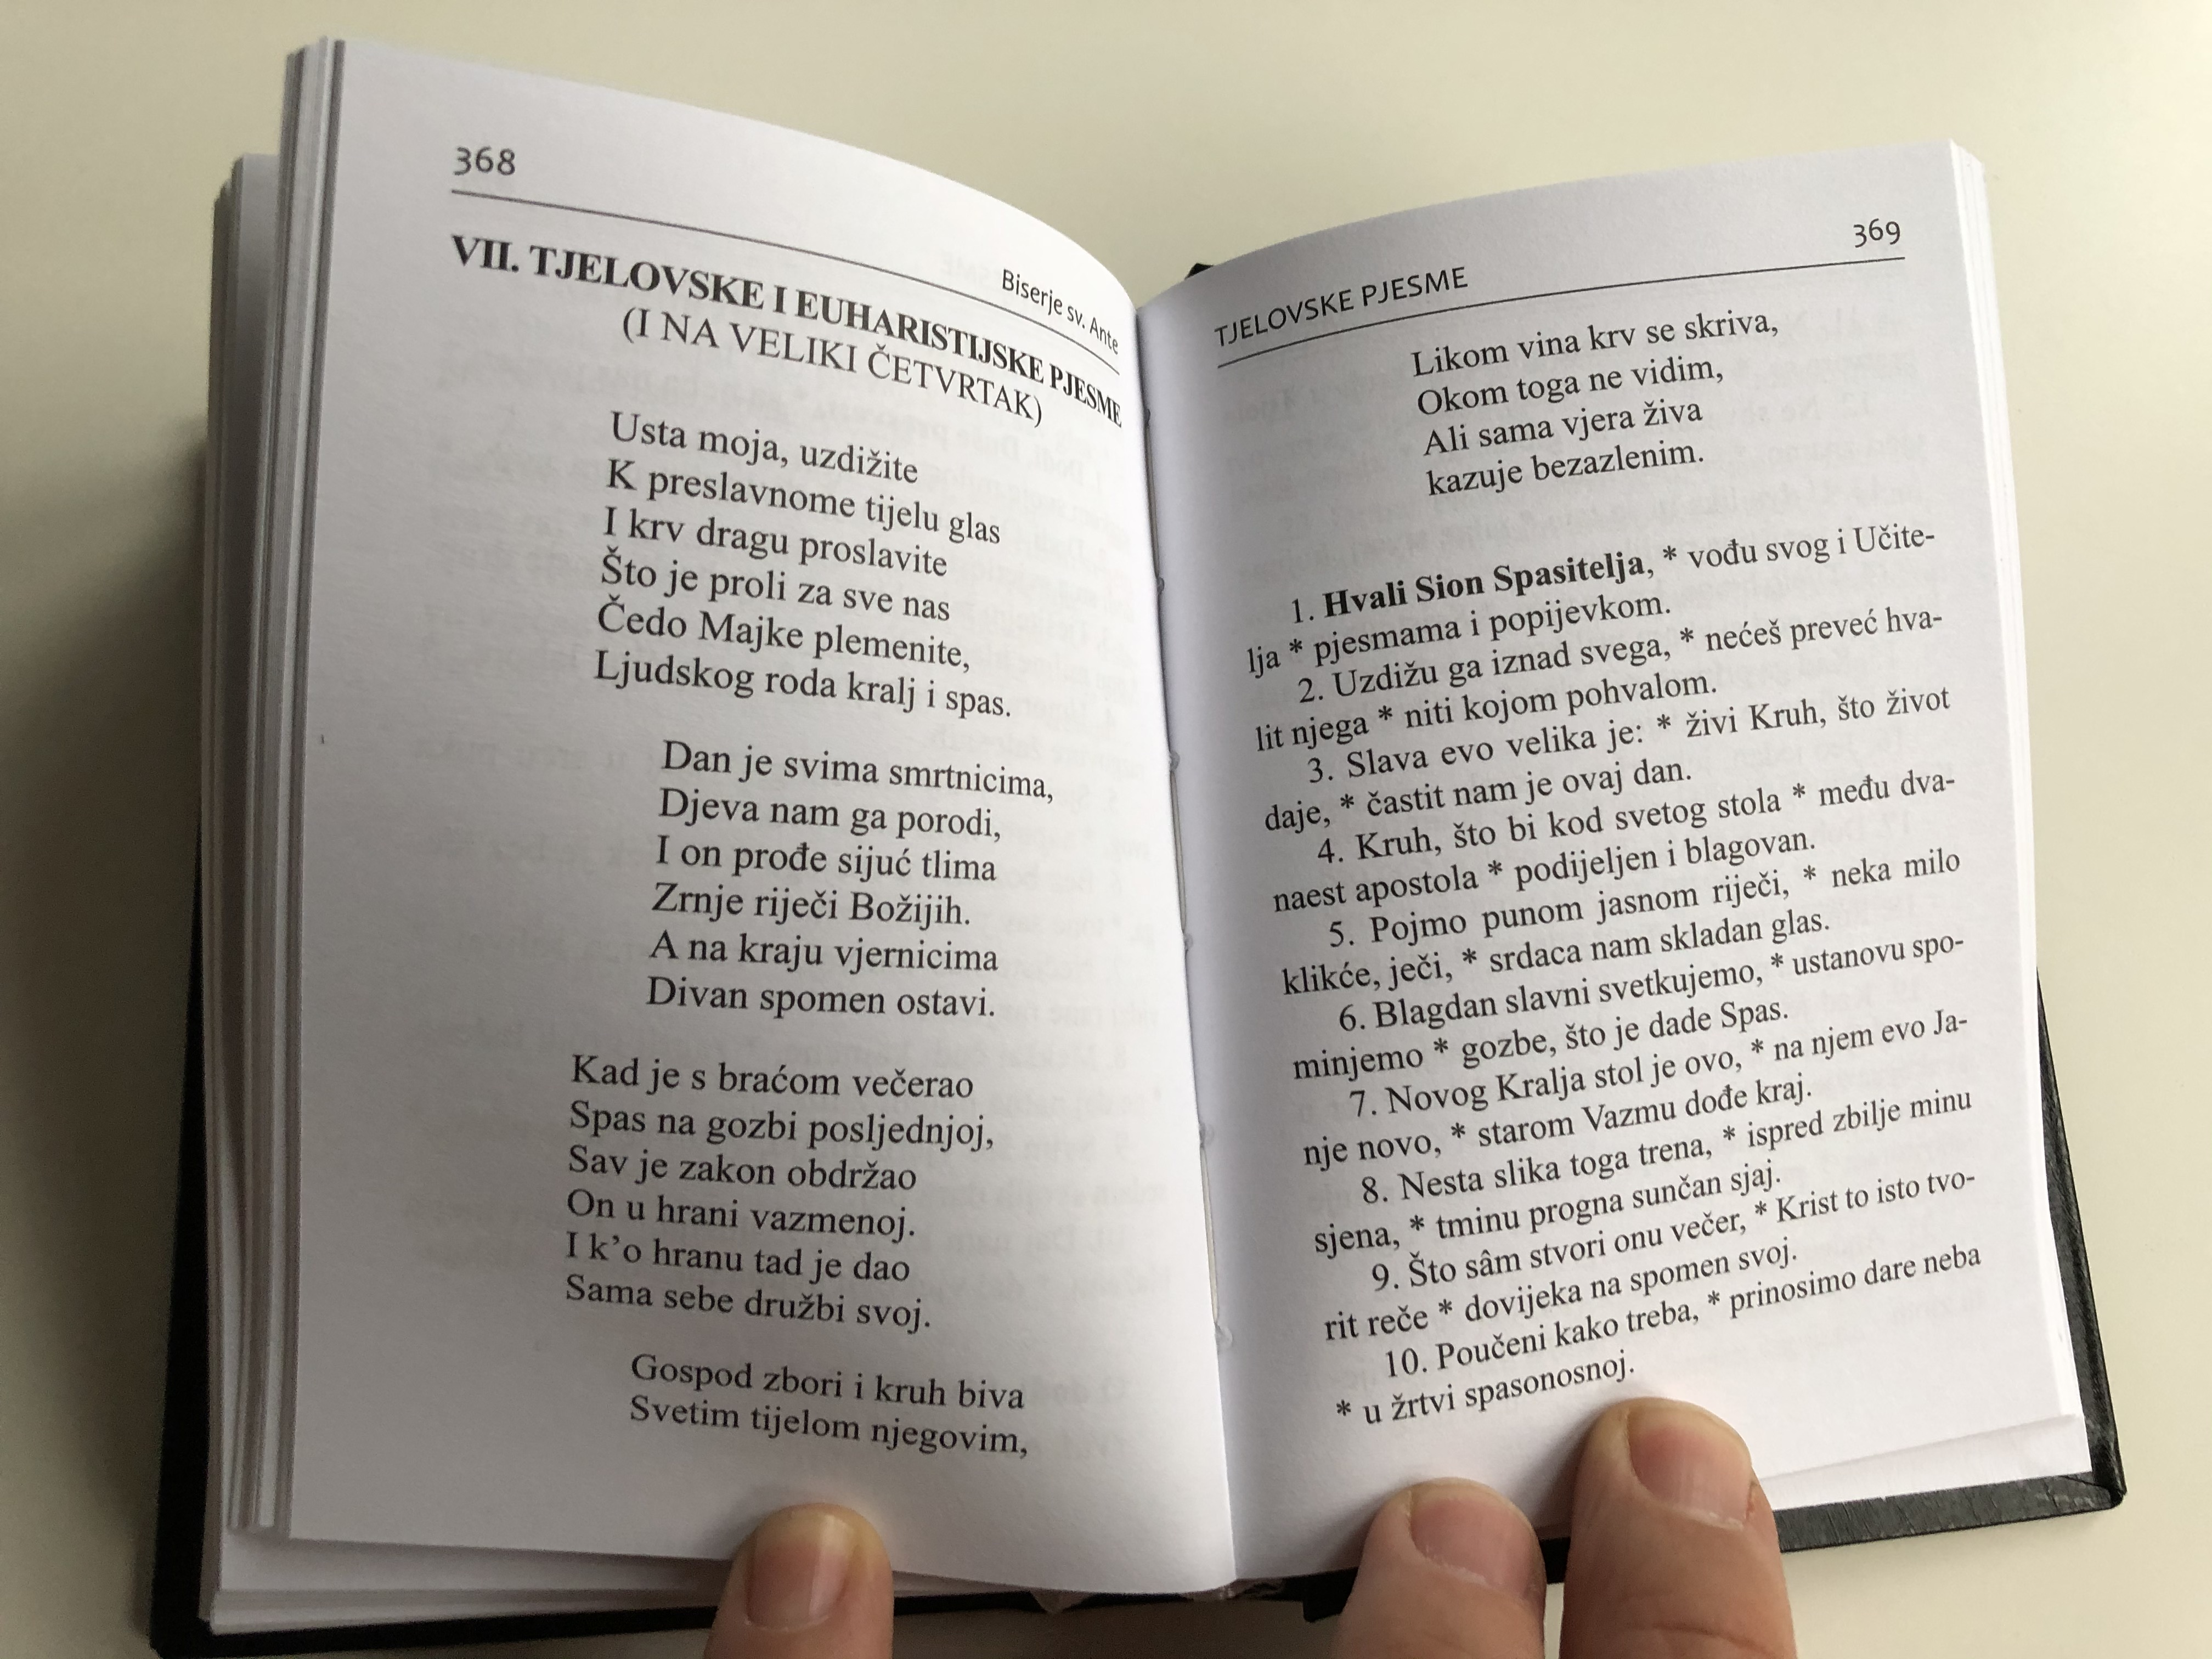 biserje-svetog-ante-pearls-of-st.-anthony-of-padua-croatian-language-catholic-prayerbook-12.jpg